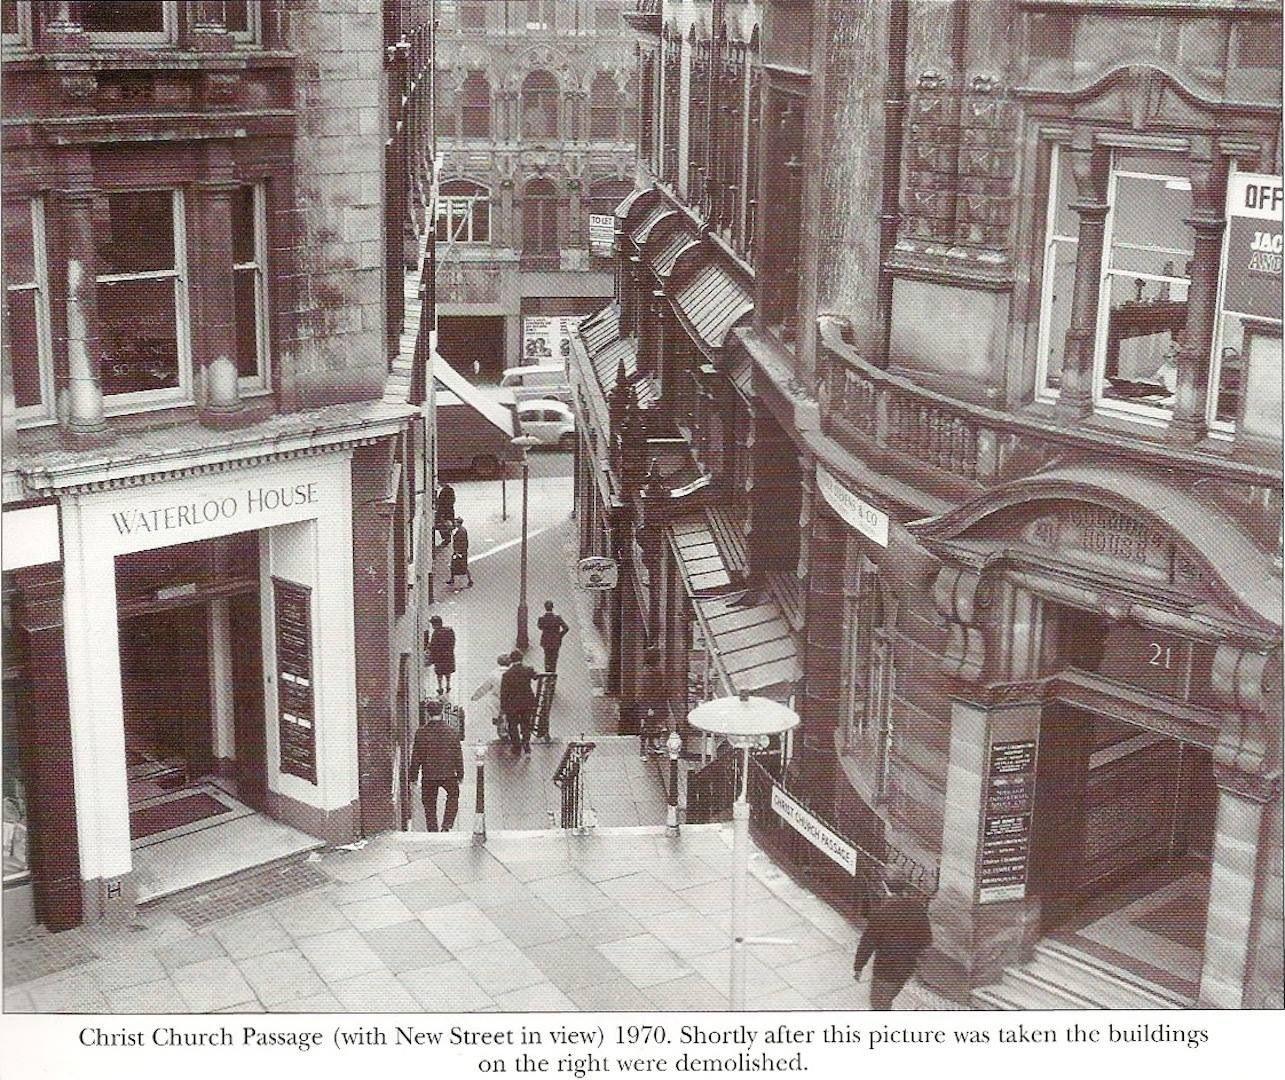 Light Warehouse Birmingham: Christchurch Passage In The City Of Birmingham